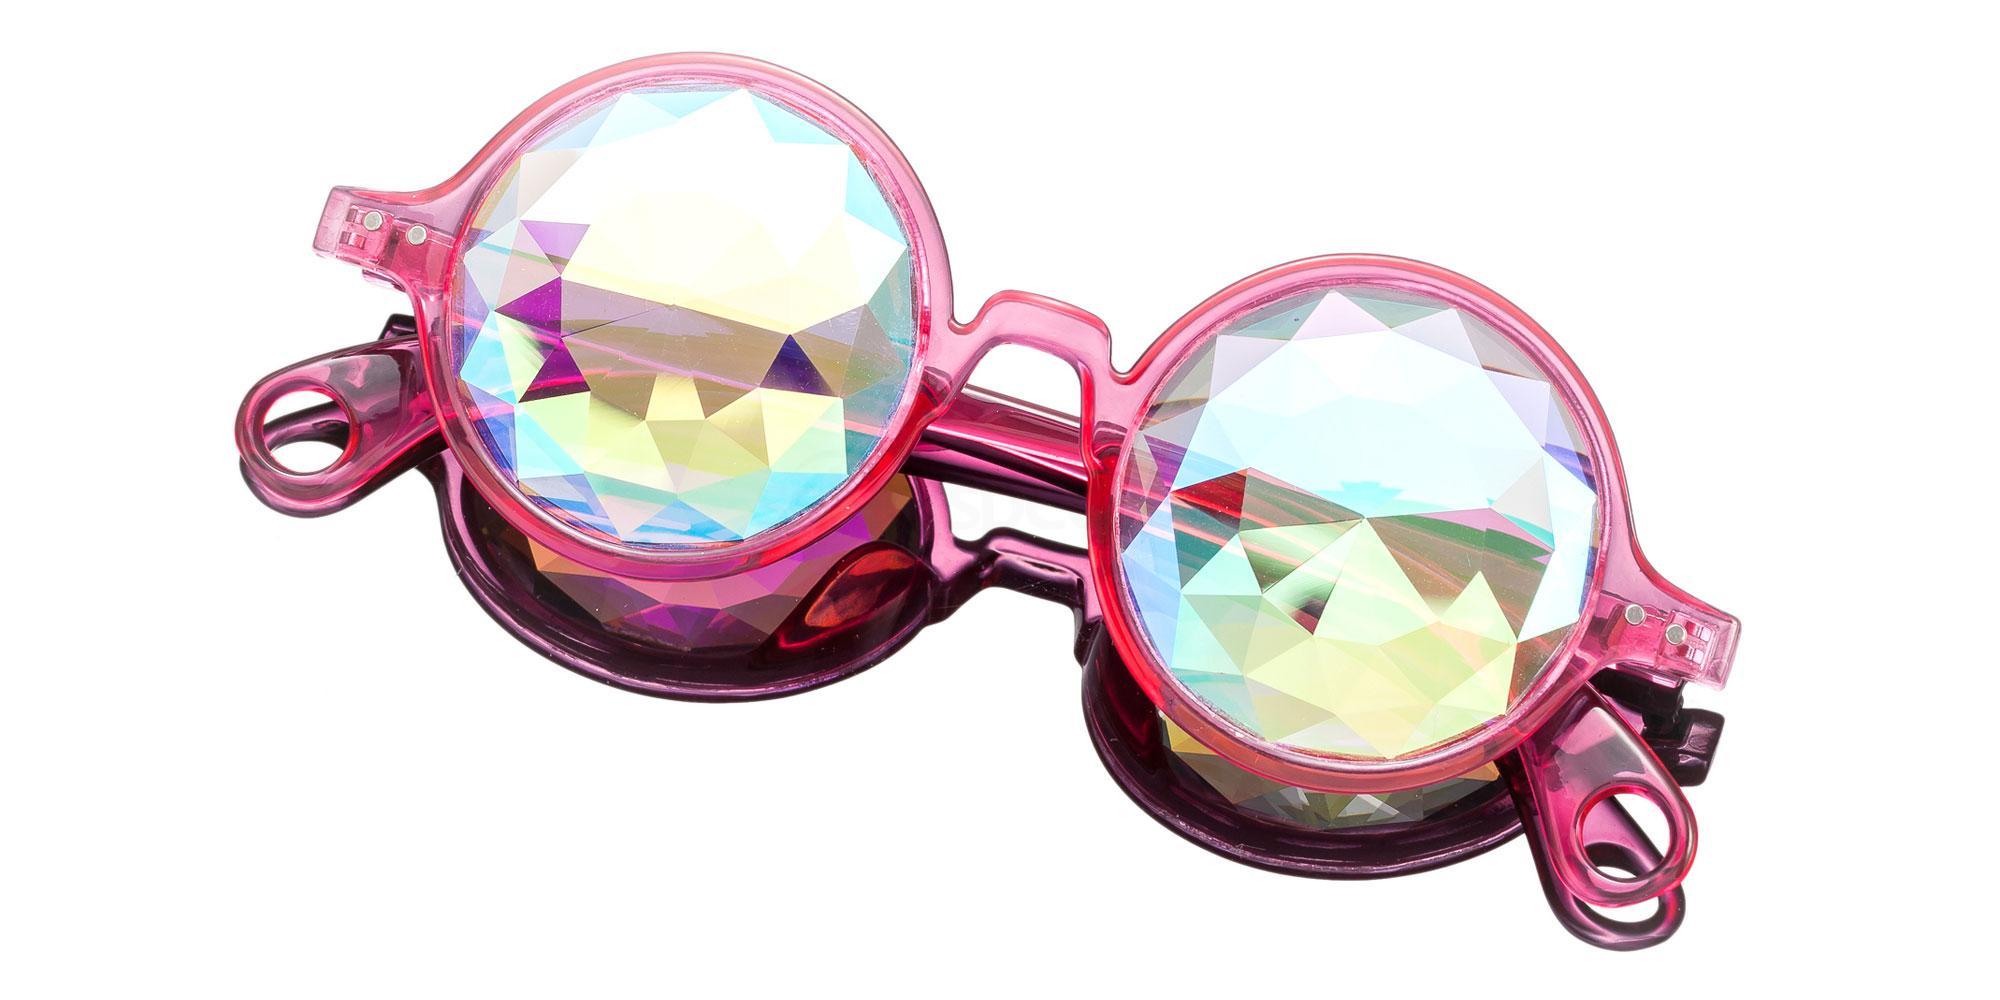 Pink Round Style Frame / Small Diamond Rainbow Lense 1004K-5 Accessories, Kolor Kaleido